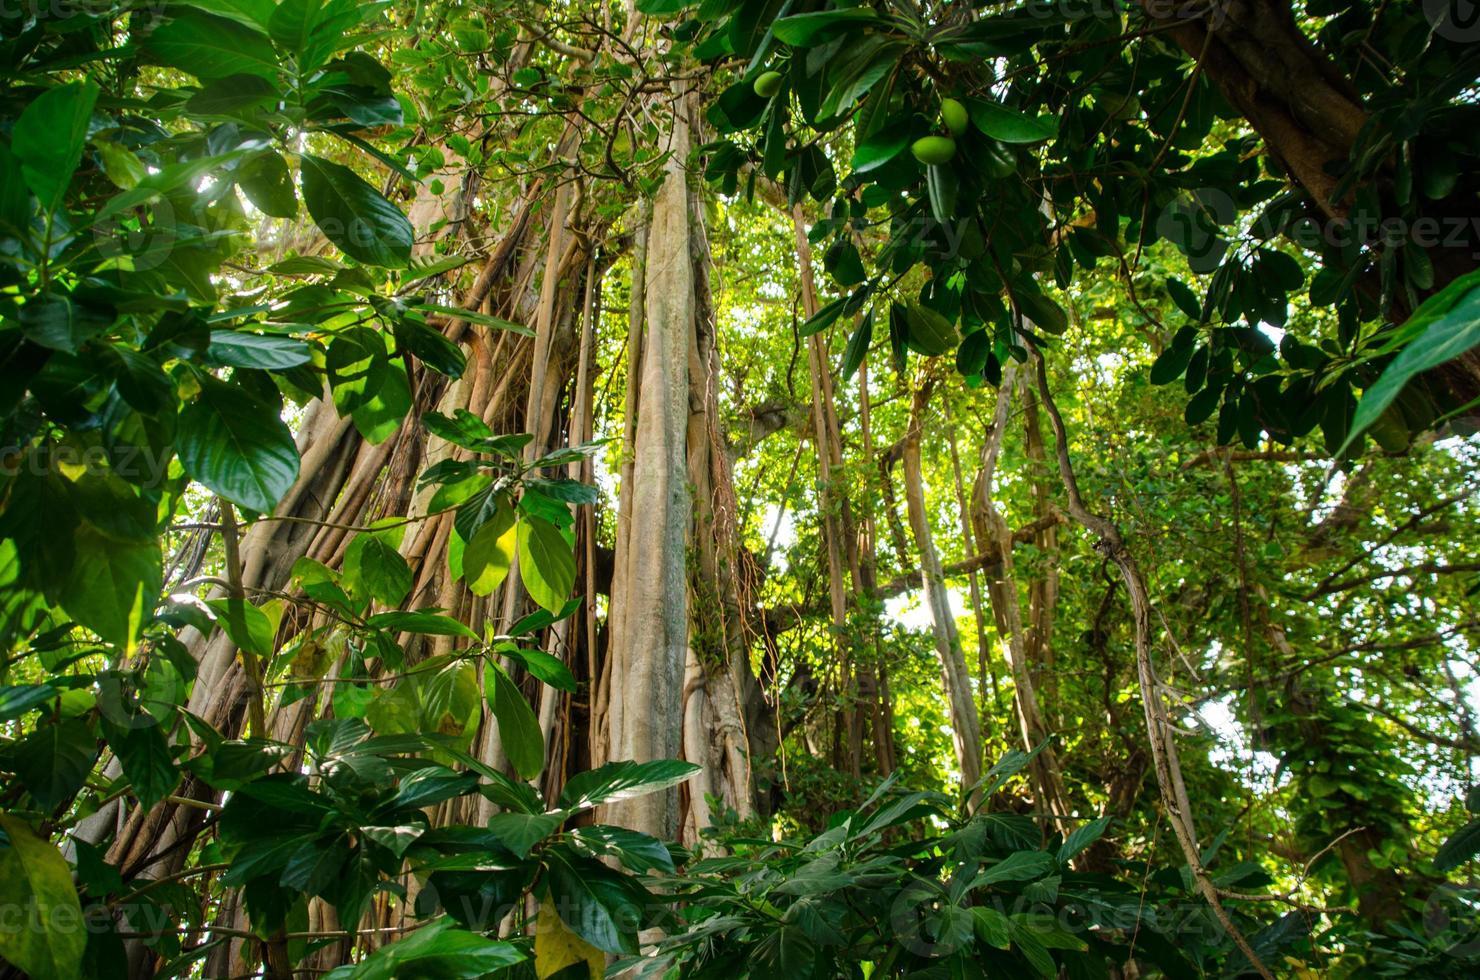 Tropical Banyan Tree photo